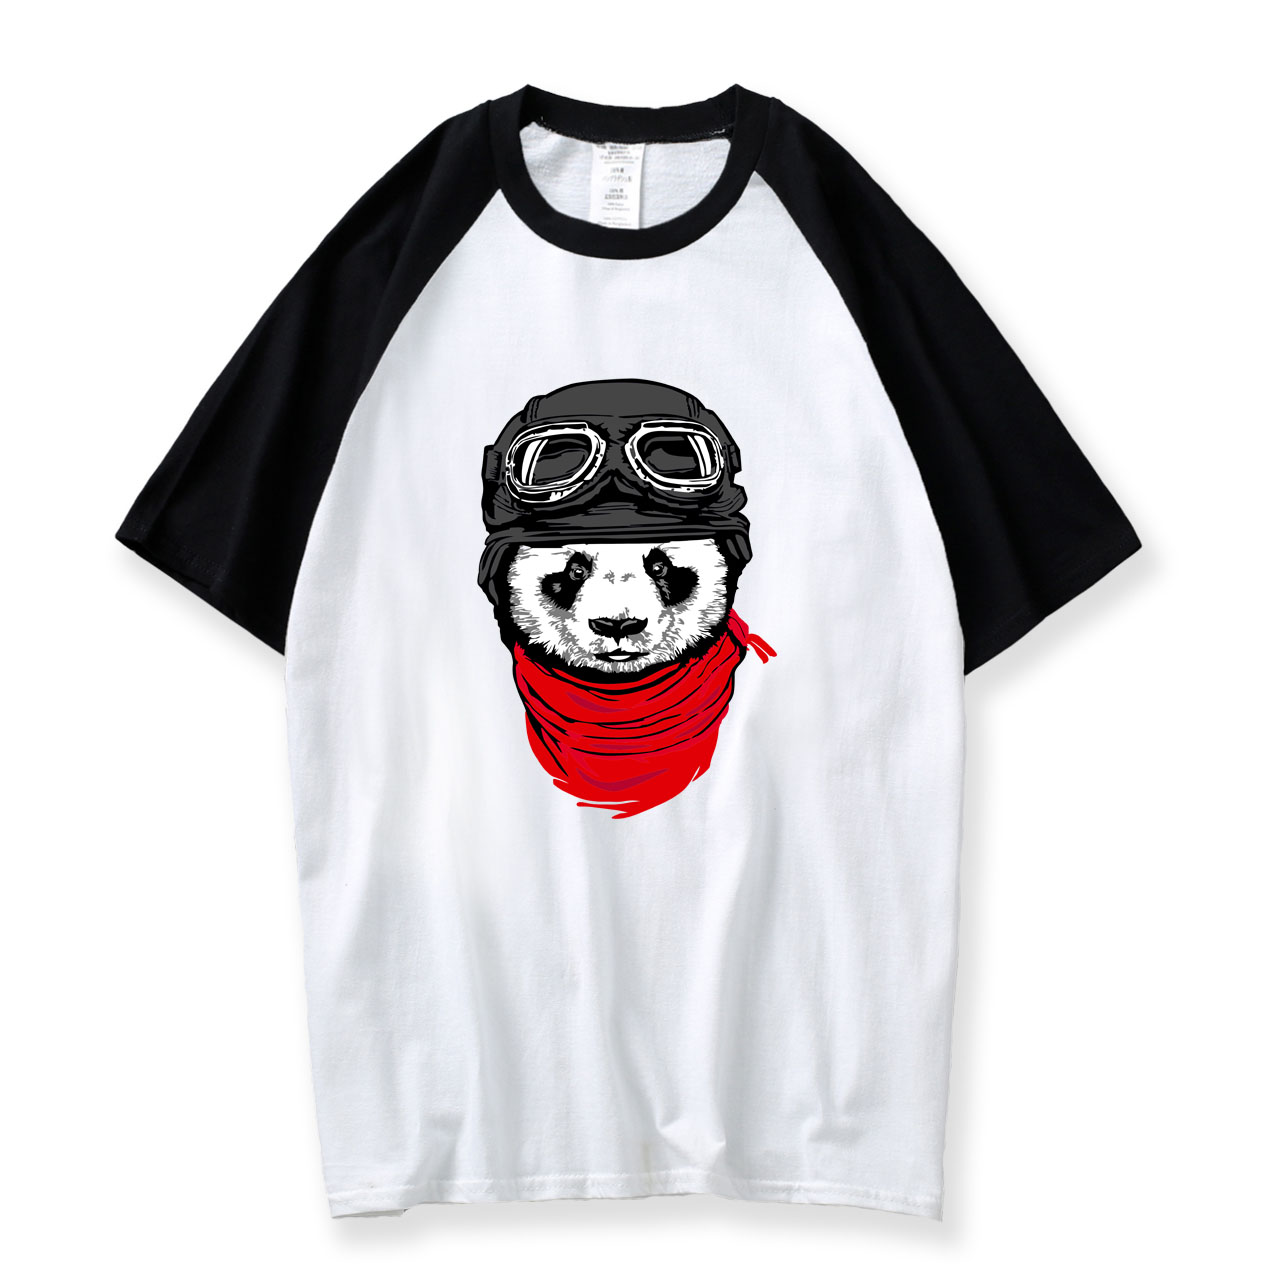 Japanese 2018 New Summer Cute Panda T-shirt Men's Fashion Raglan Sleeve T shirt Harajuku Funny Men Tee Shirts Hipster Cool Top